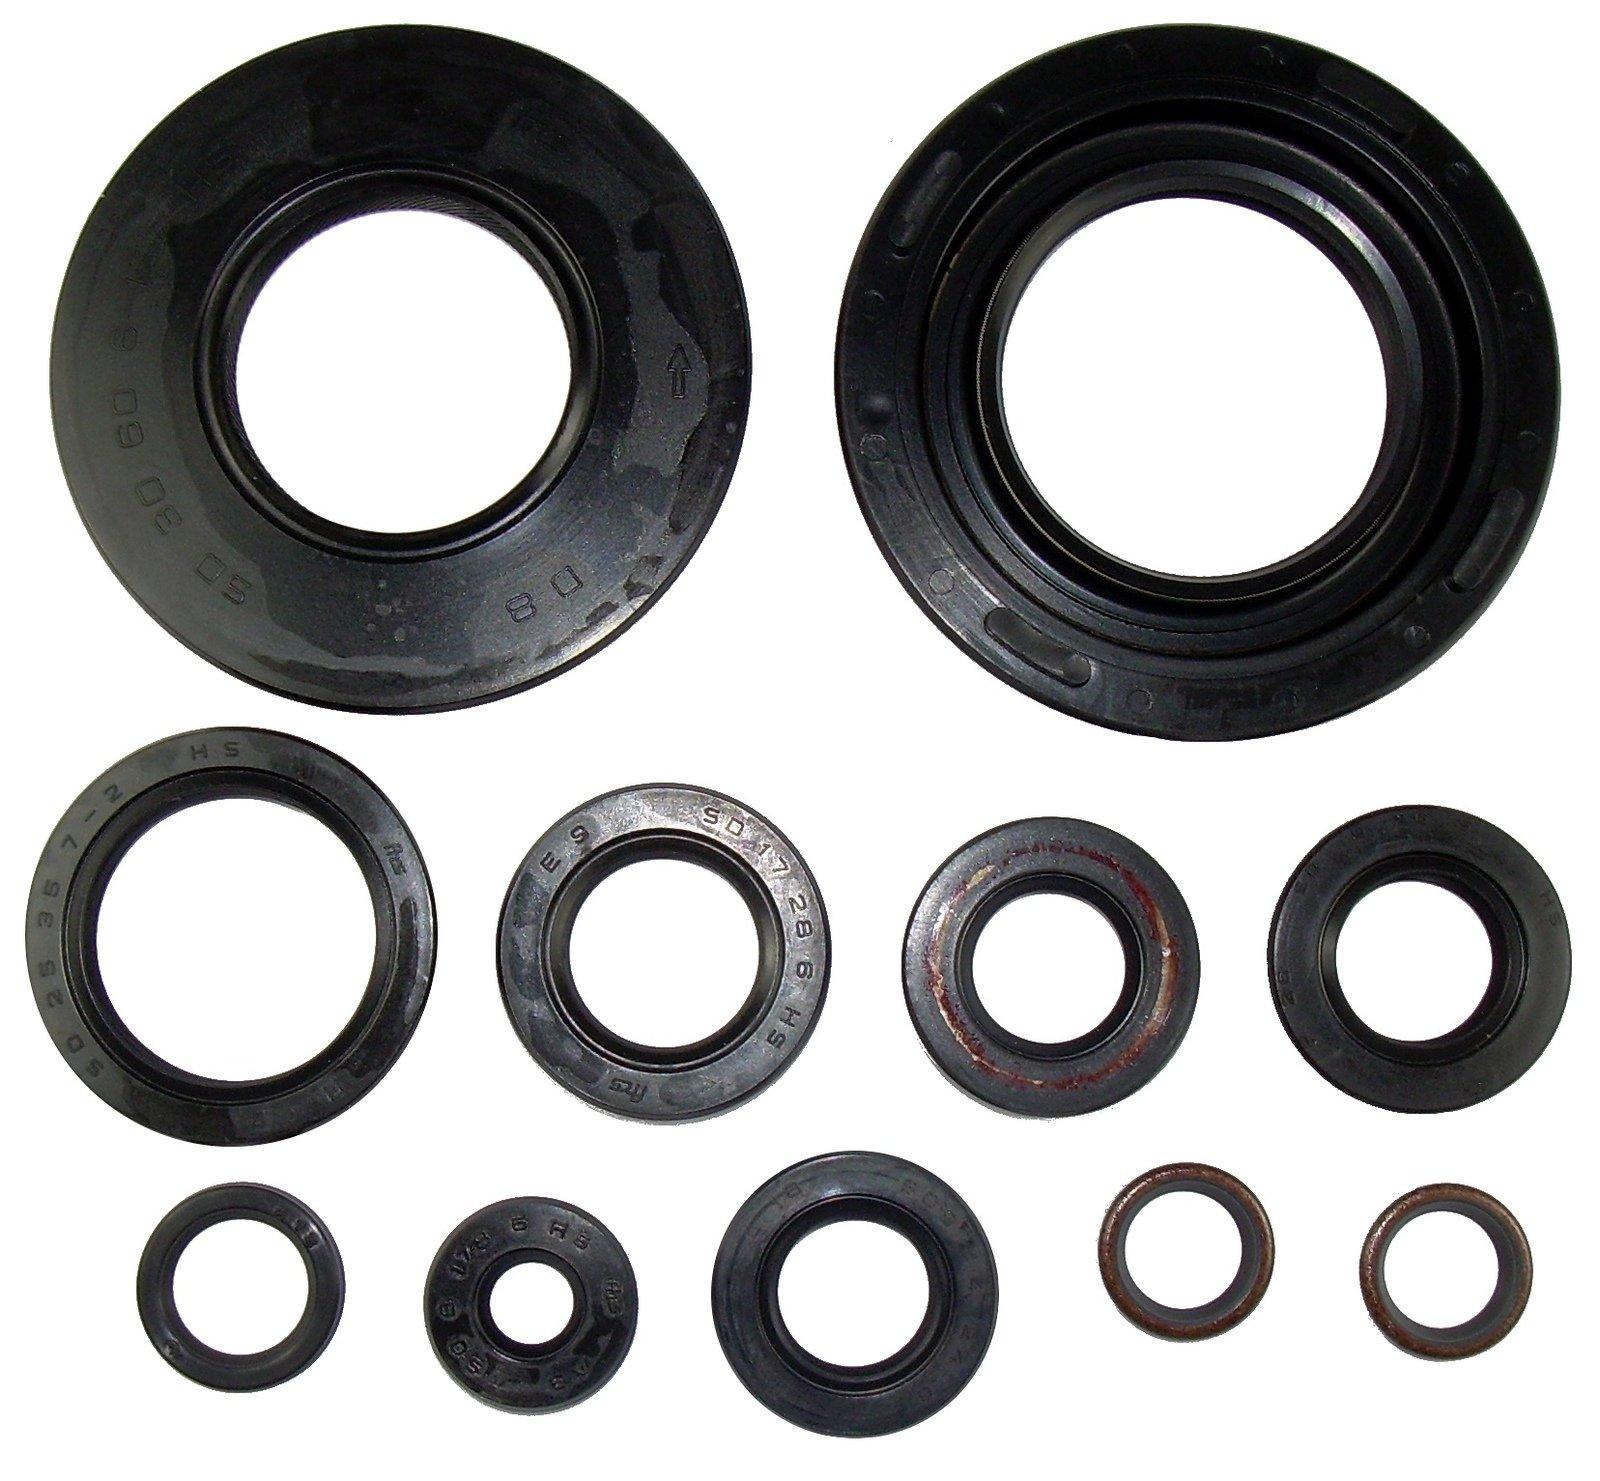 Engine Shaft Seal Kit For TT500 XT500 11PCS 1-179